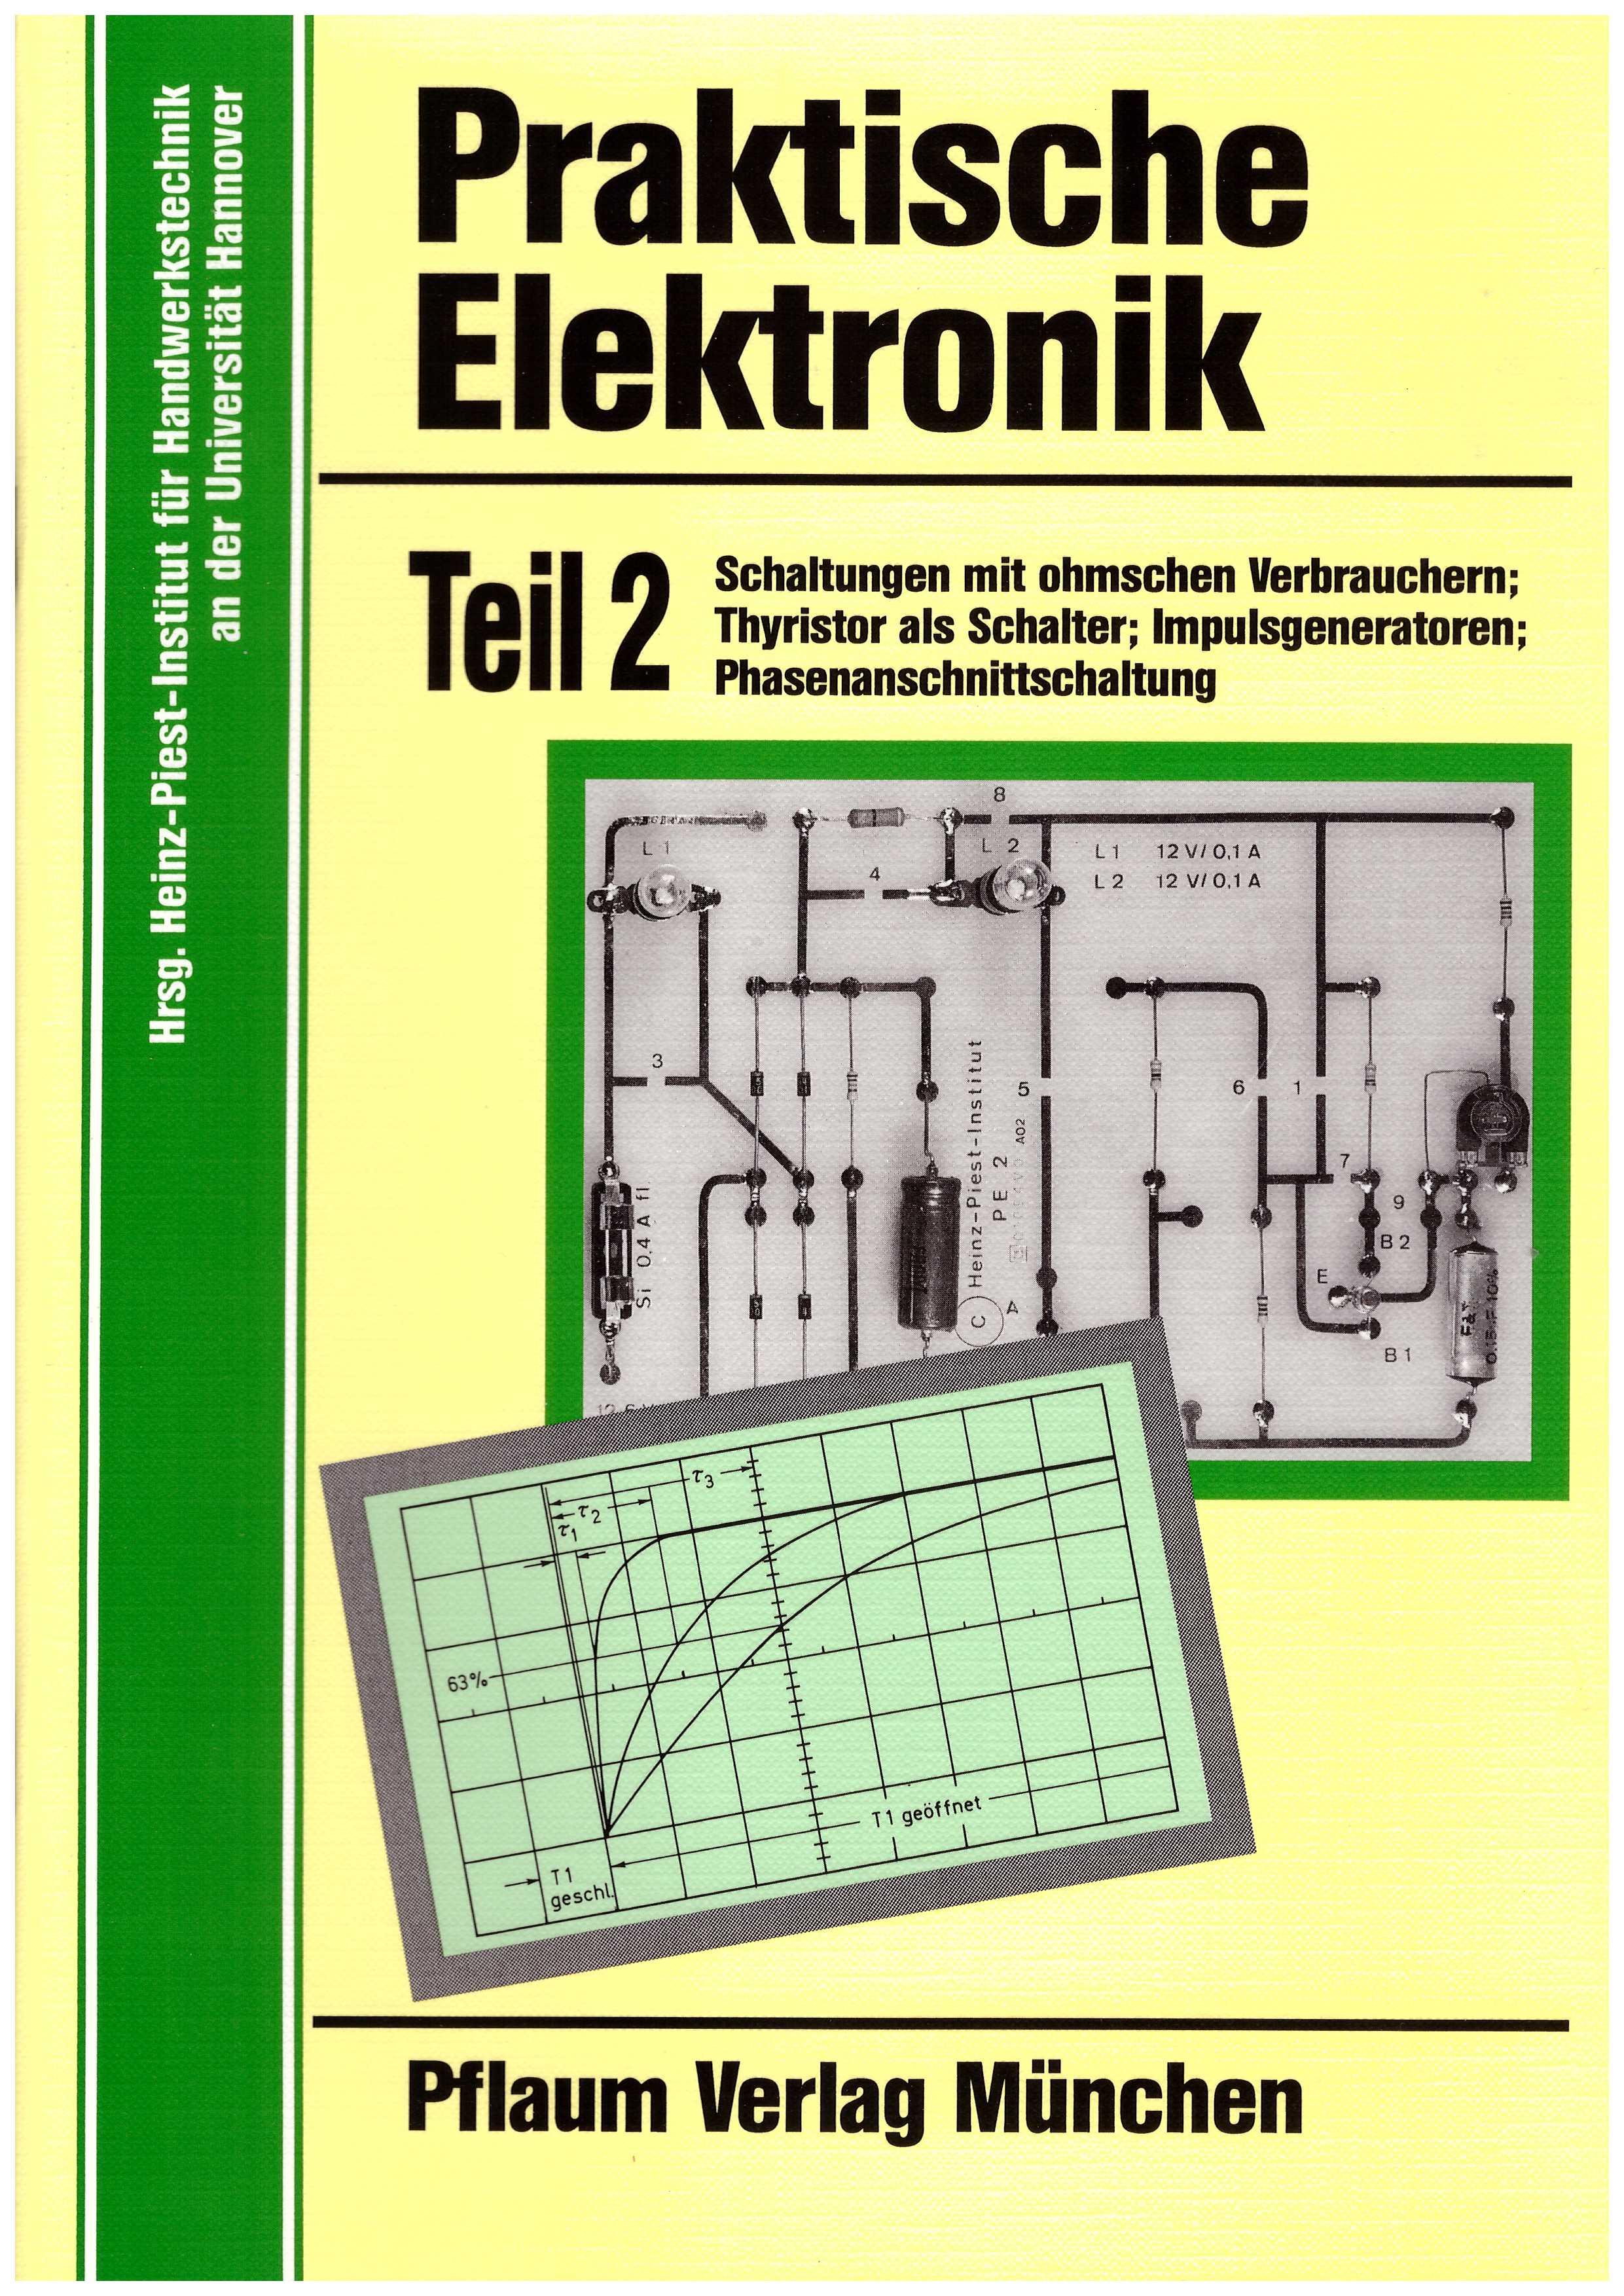 Charmant Spur 90 Schaltplan Ideen - Schaltplan Serie Circuit ...